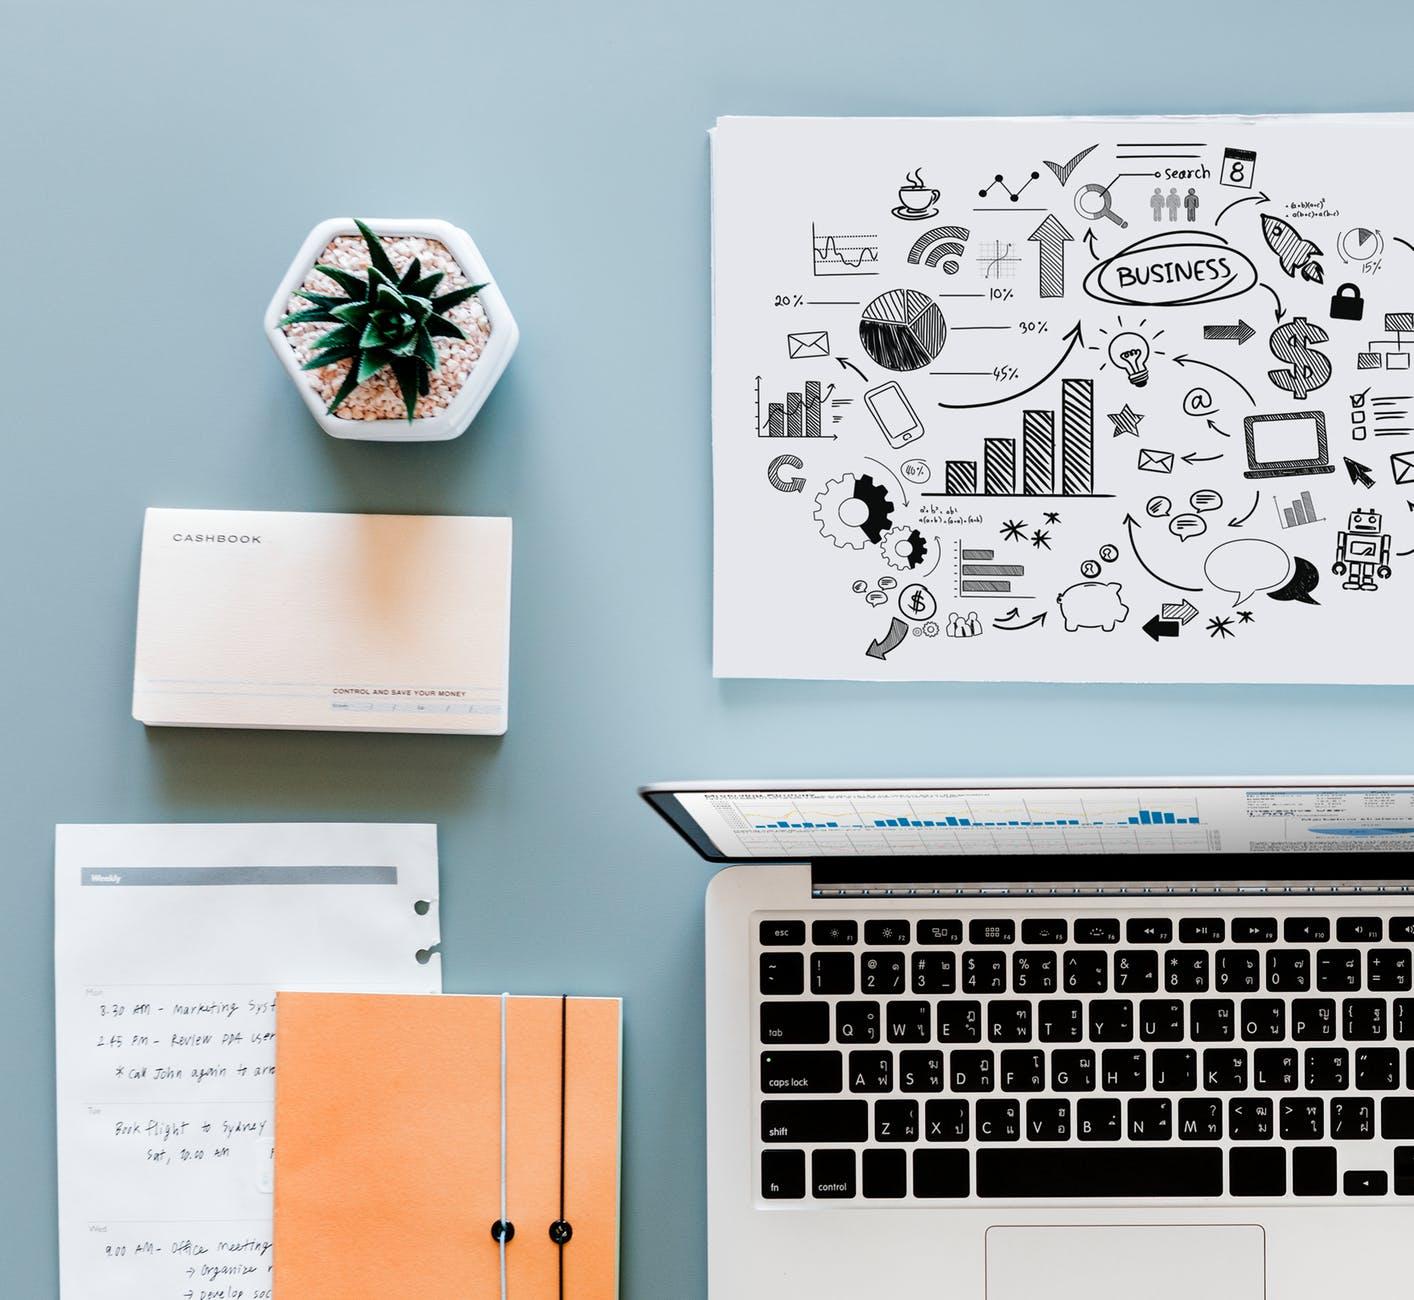 macbook air beside printing paper